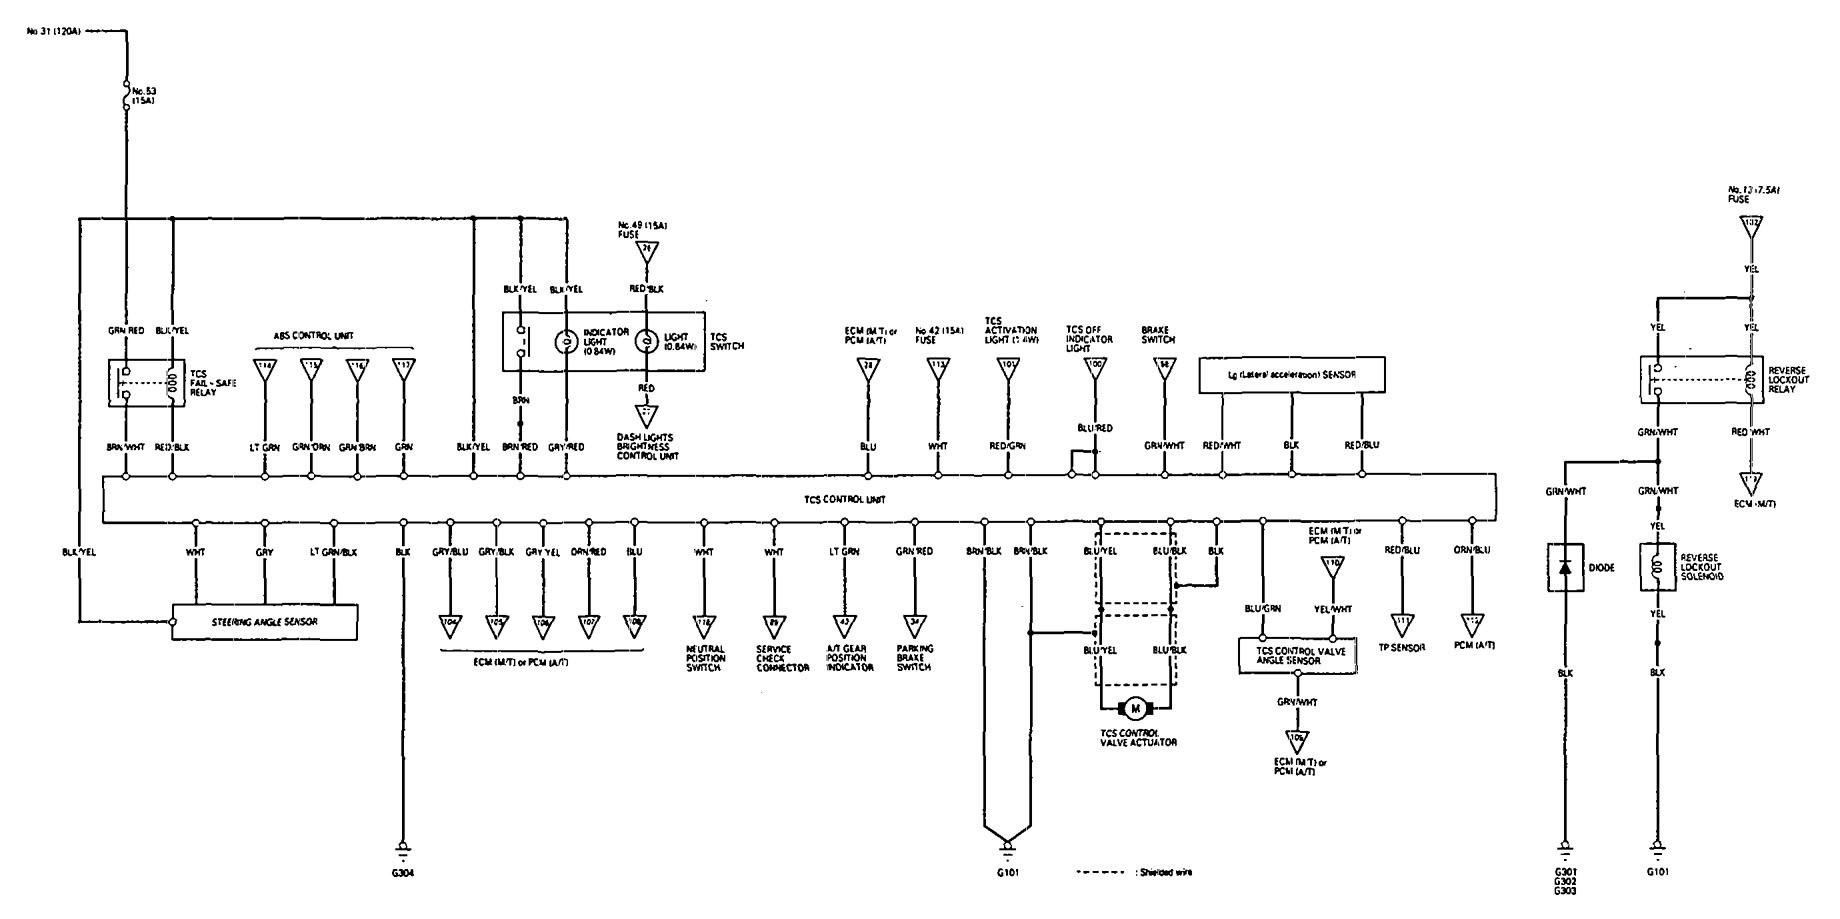 Acura Legend (1993) - wiring diagram - look up control ...